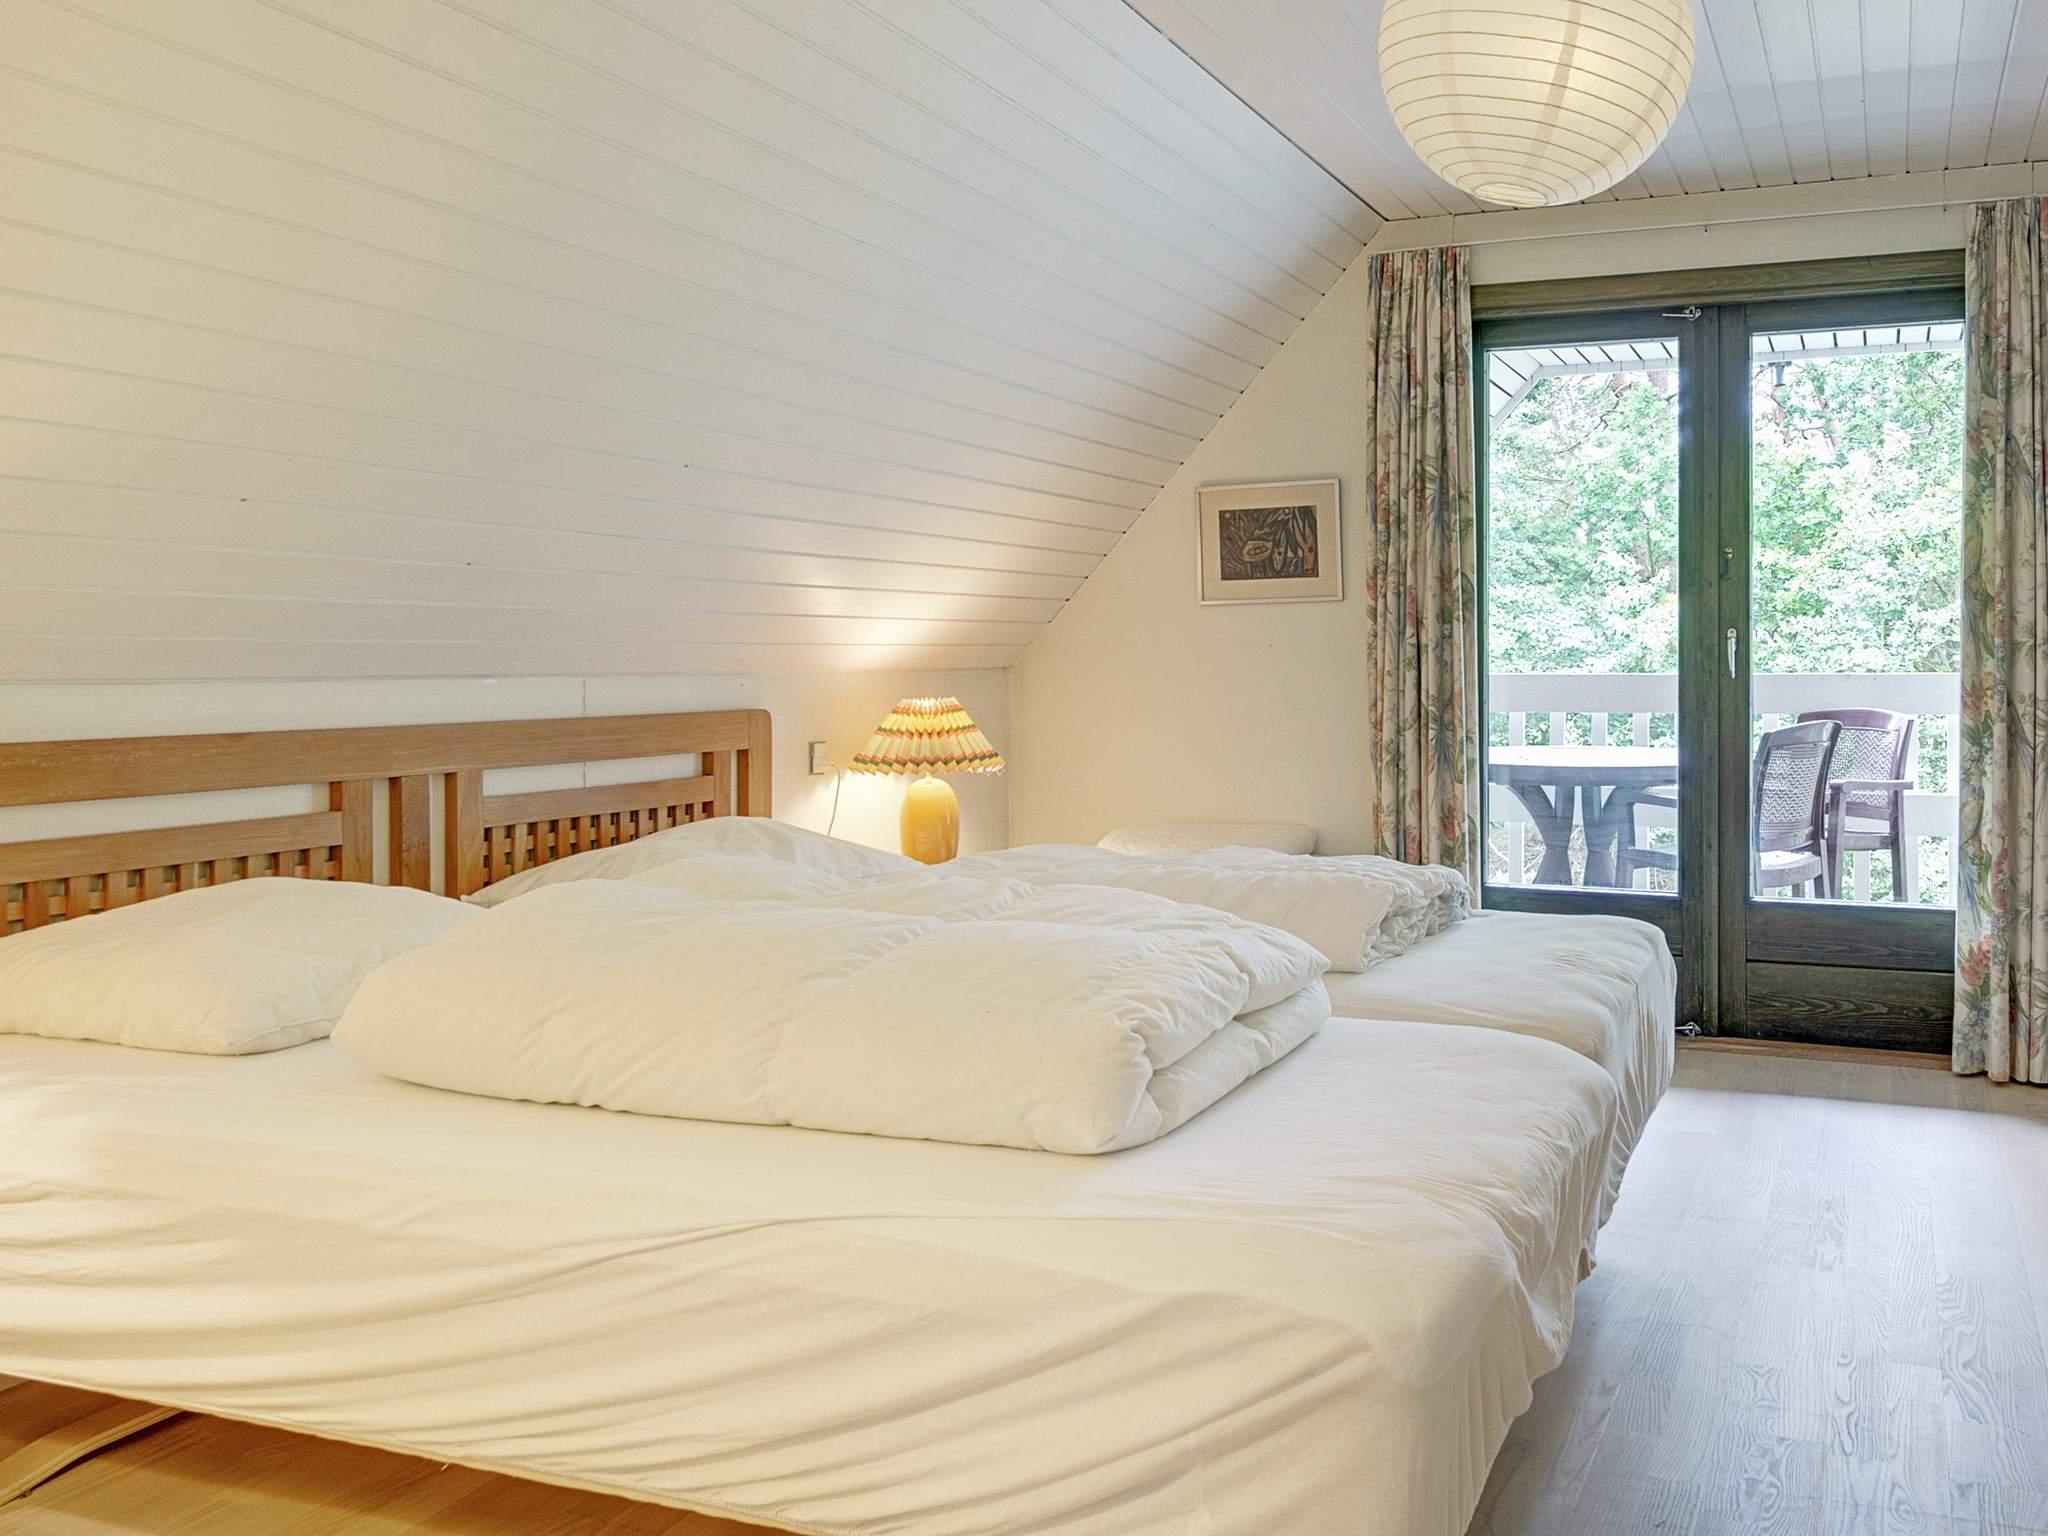 Ferienhaus Balka Strand (660138), Balke, , Bornholm, Dänemark, Bild 8